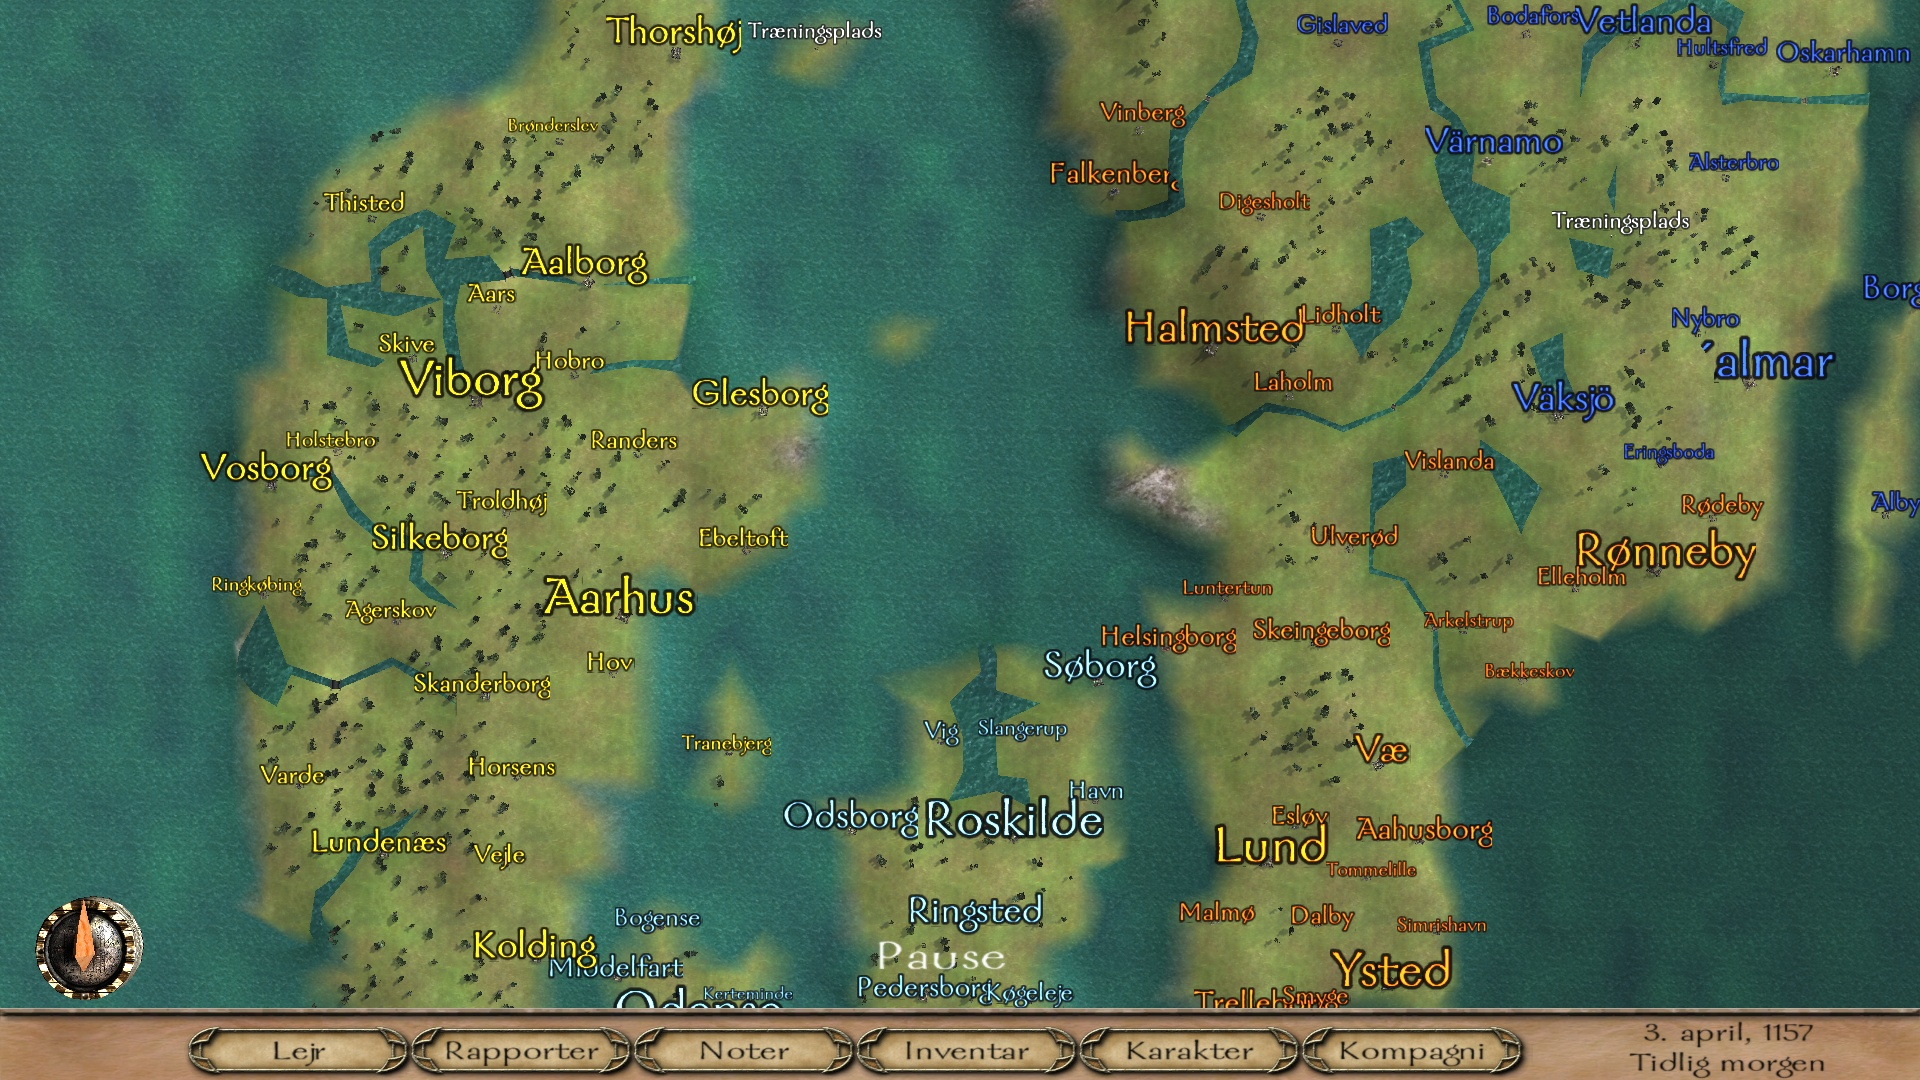 Spen borgerkrigen 1157 la guerra civil danesa 1157 ampliar esta imagenducir esta imagen clic aqu para ver su tamao original gumiabroncs Choice Image